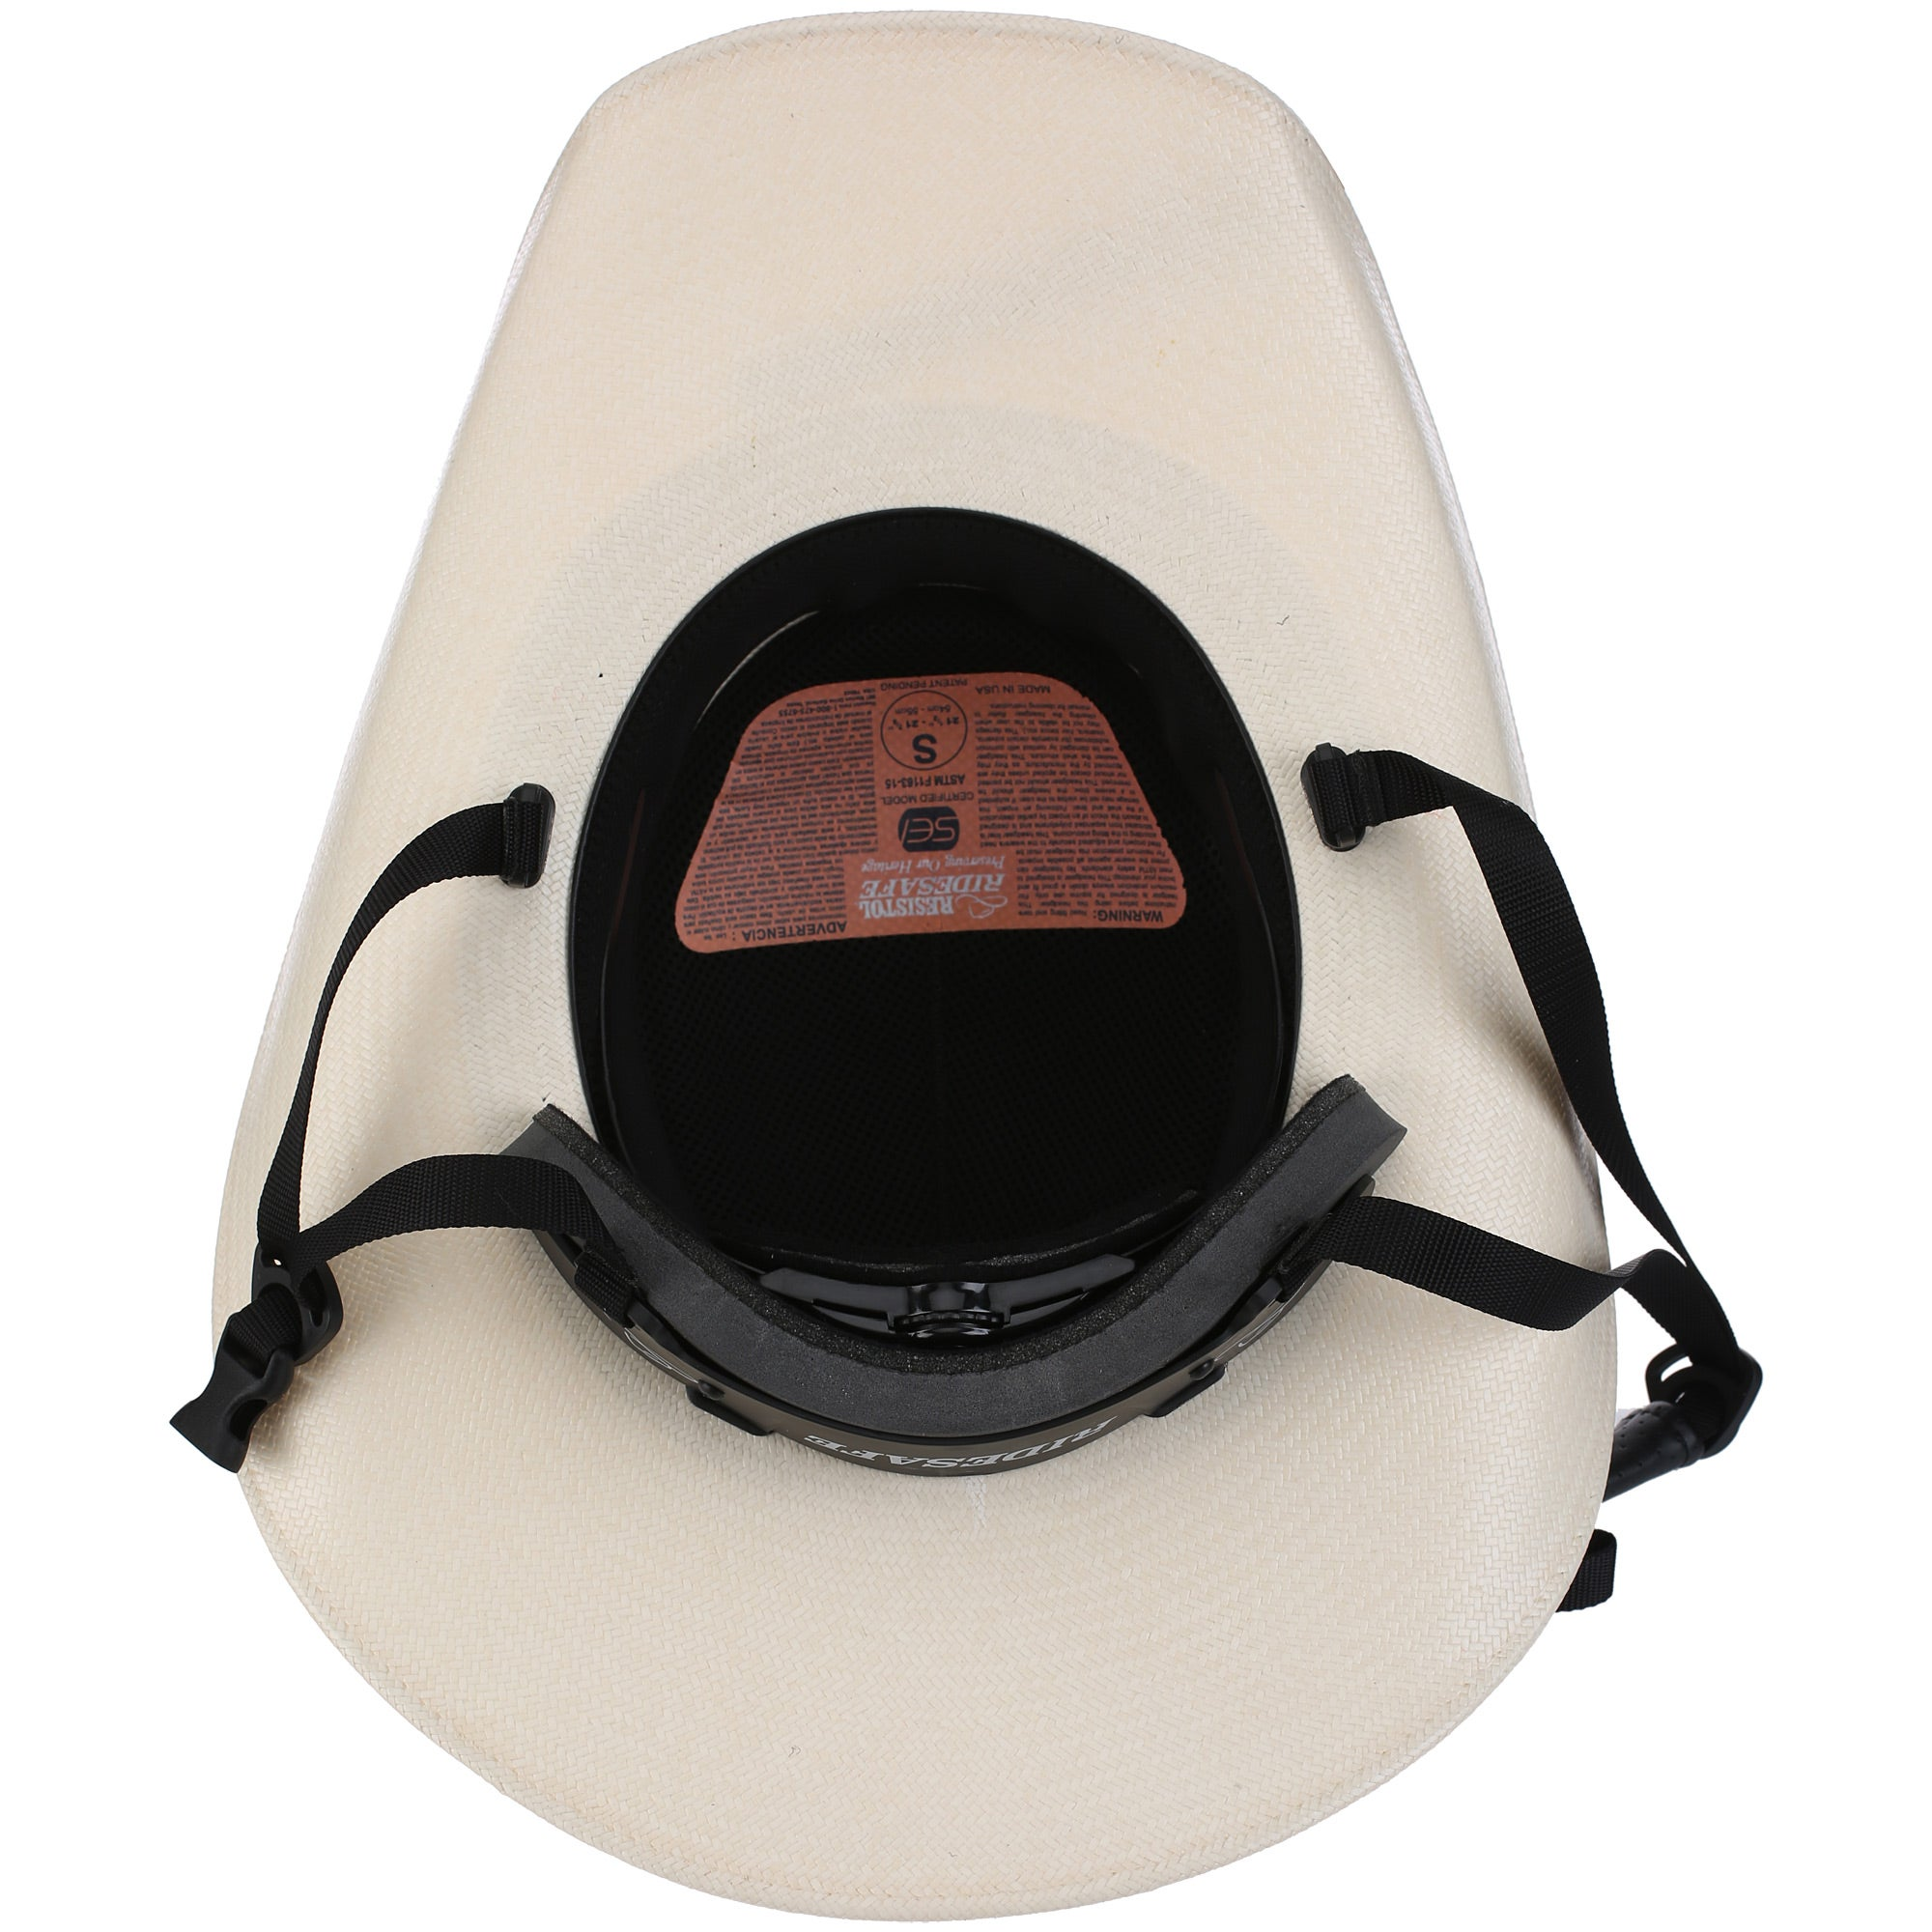 d2a20c1a360 Resistol RideSafe Western Straw Cowboy Hat Helmet - Riding Warehouse